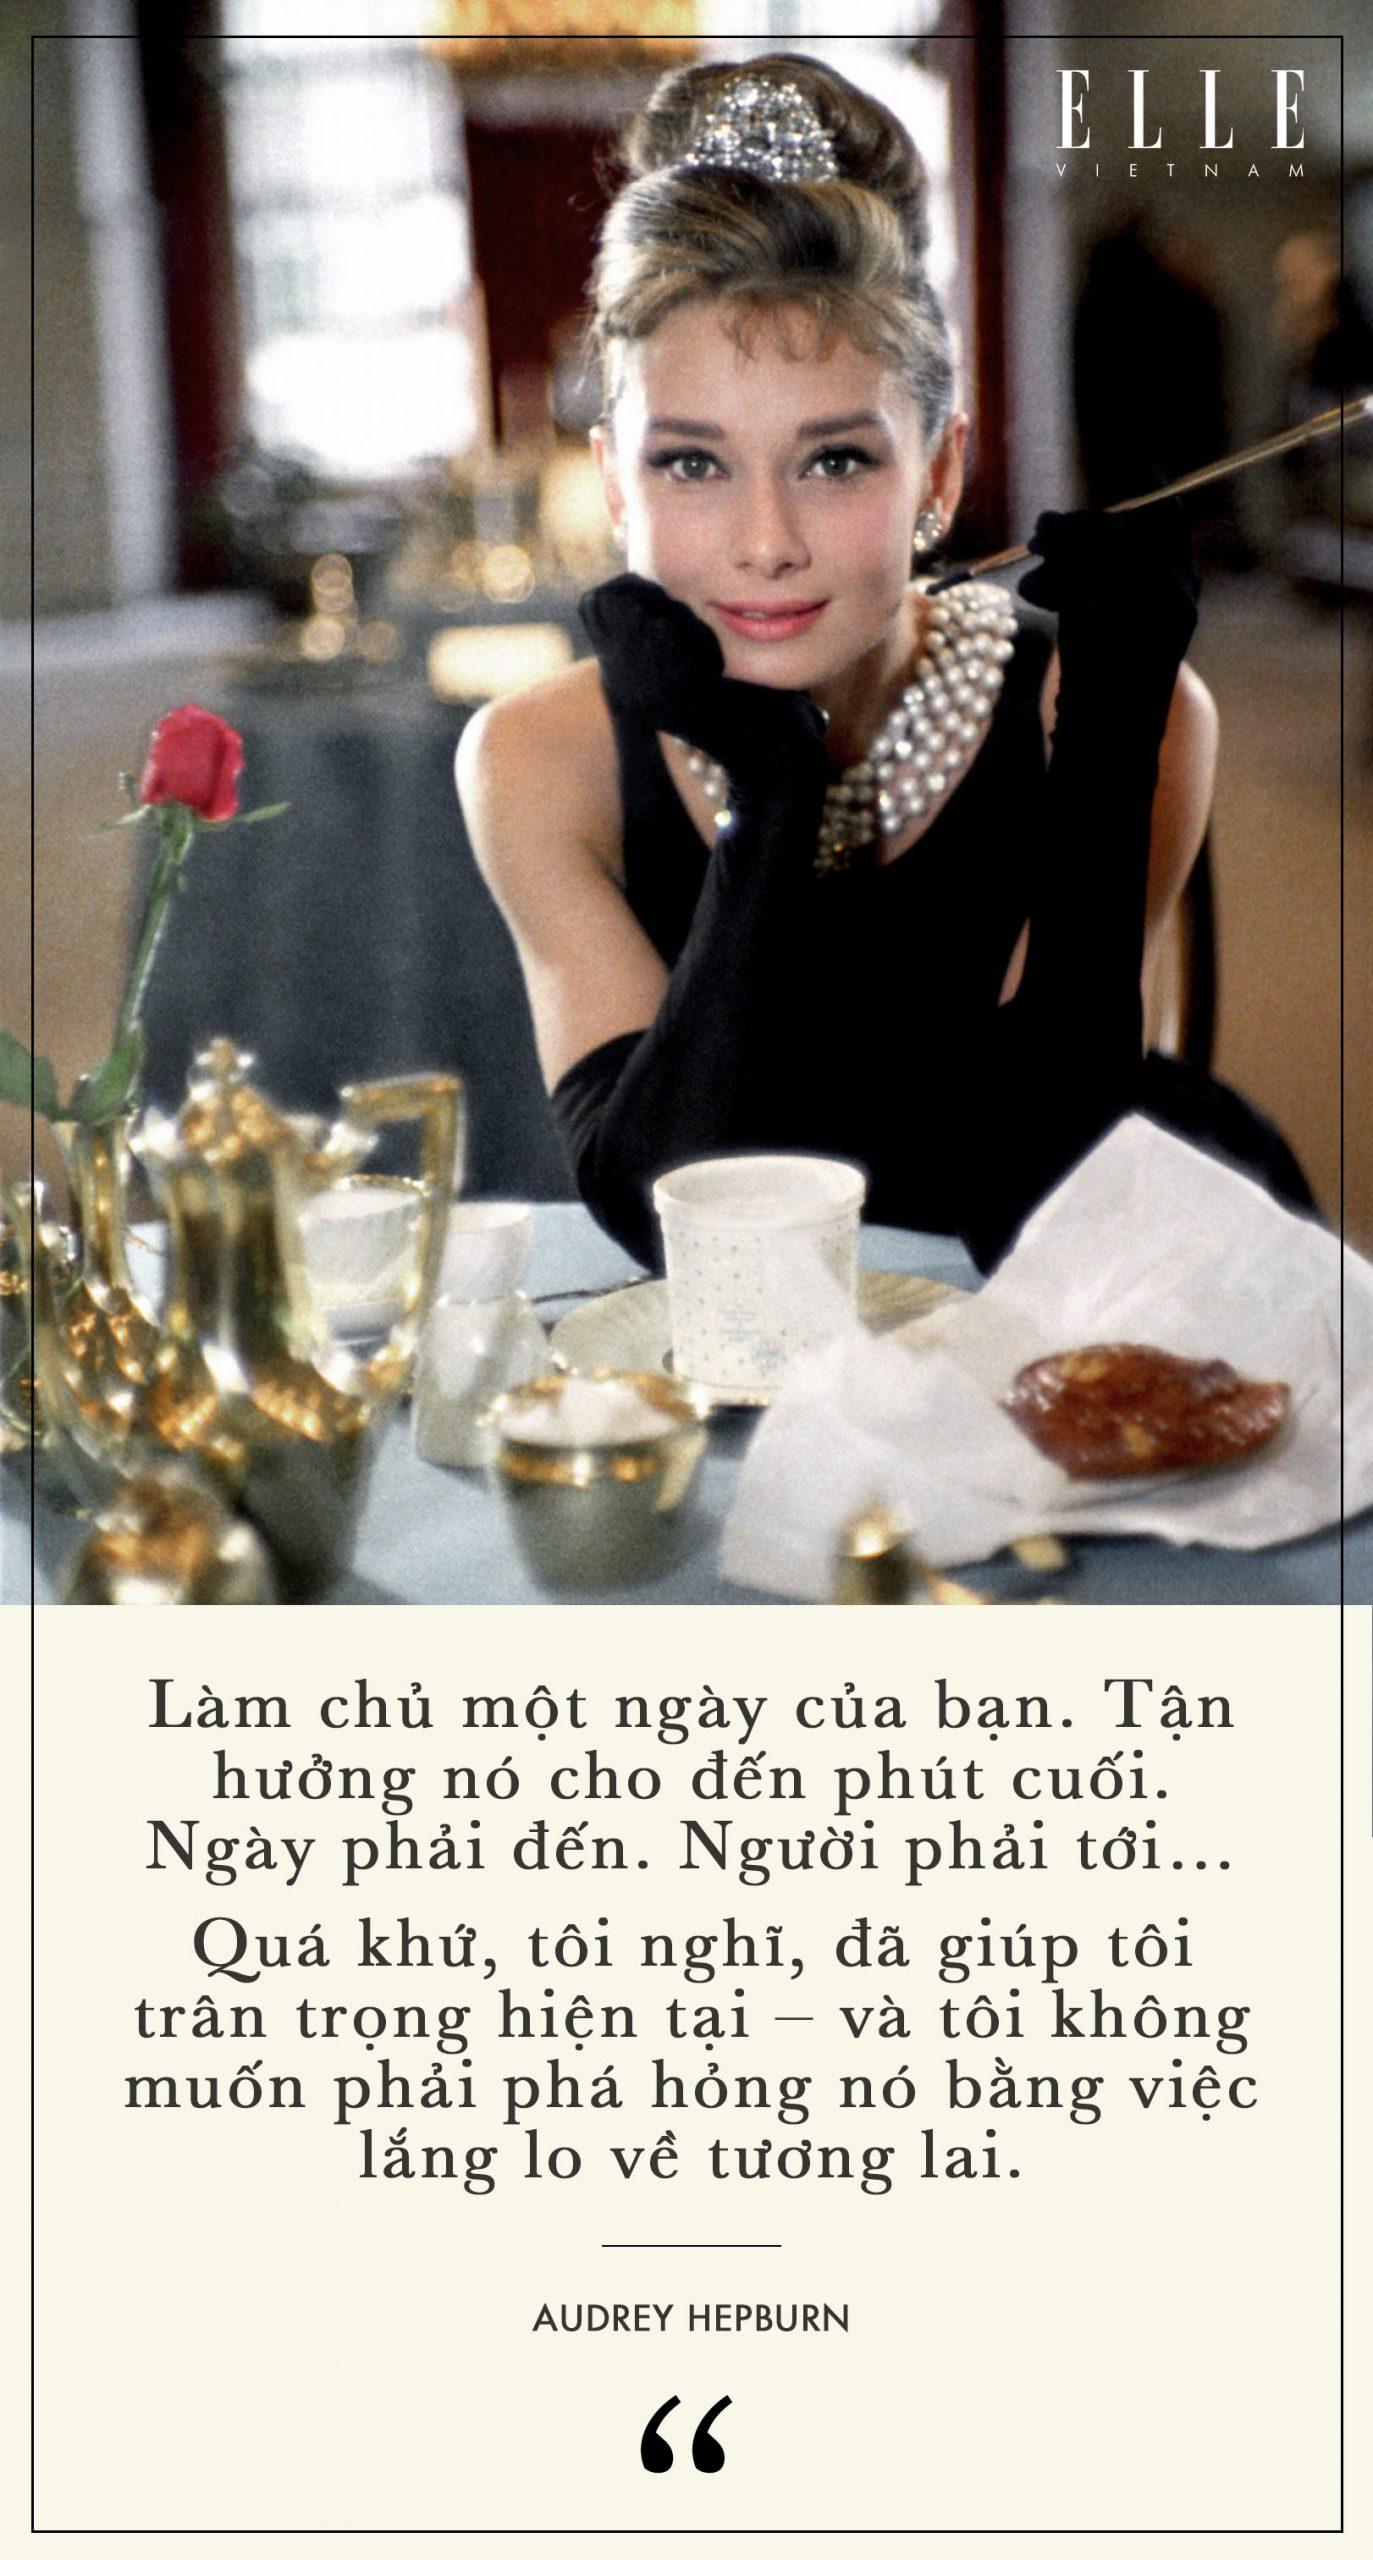 diễn viên Audrey Hepburn 1